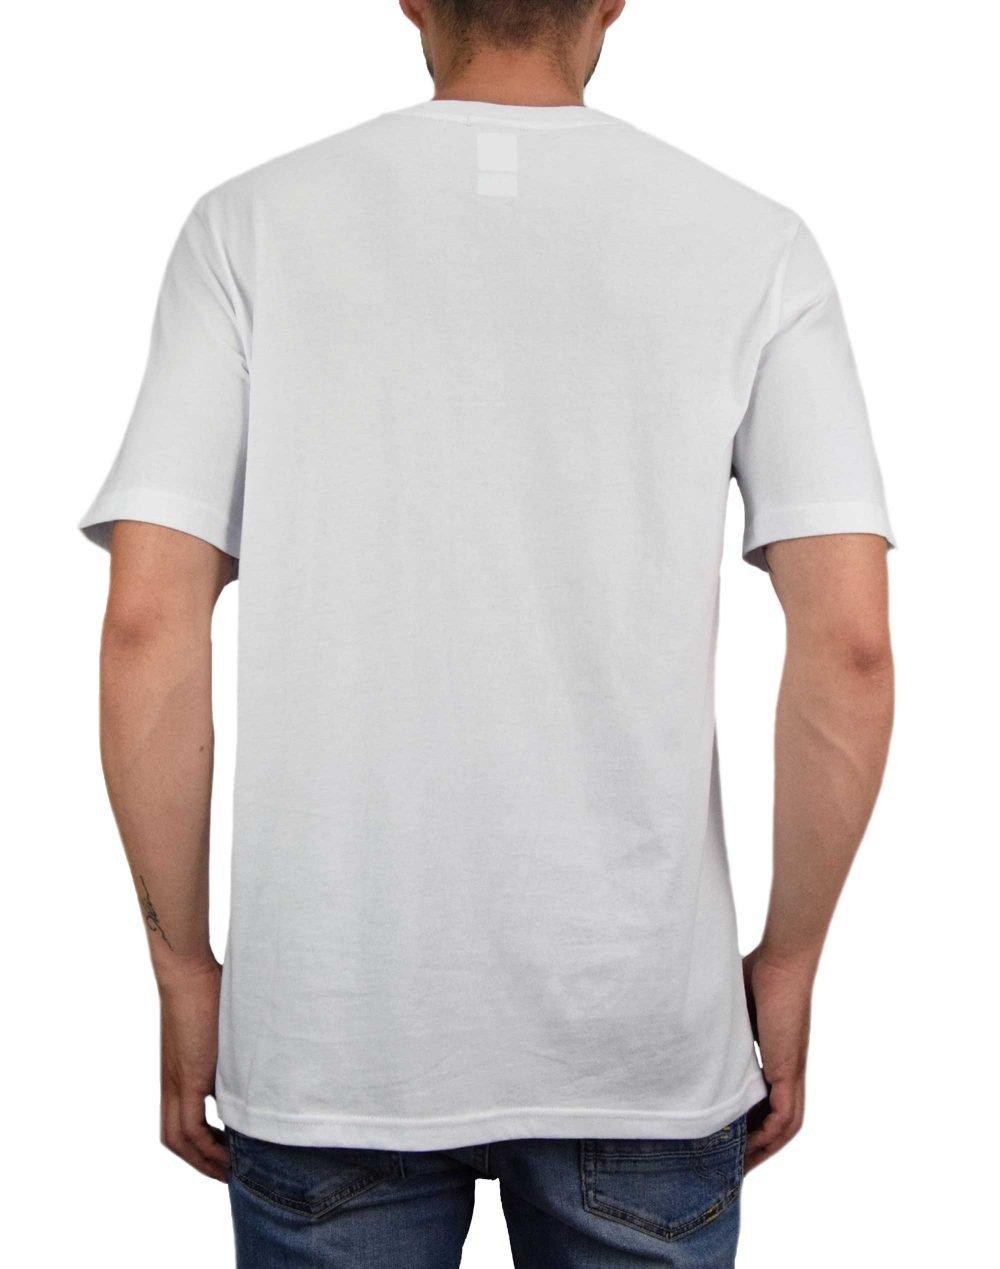 Herschel Supply Co Men's Two Tone Logo Stamp Tee (50027-00543) Bright White